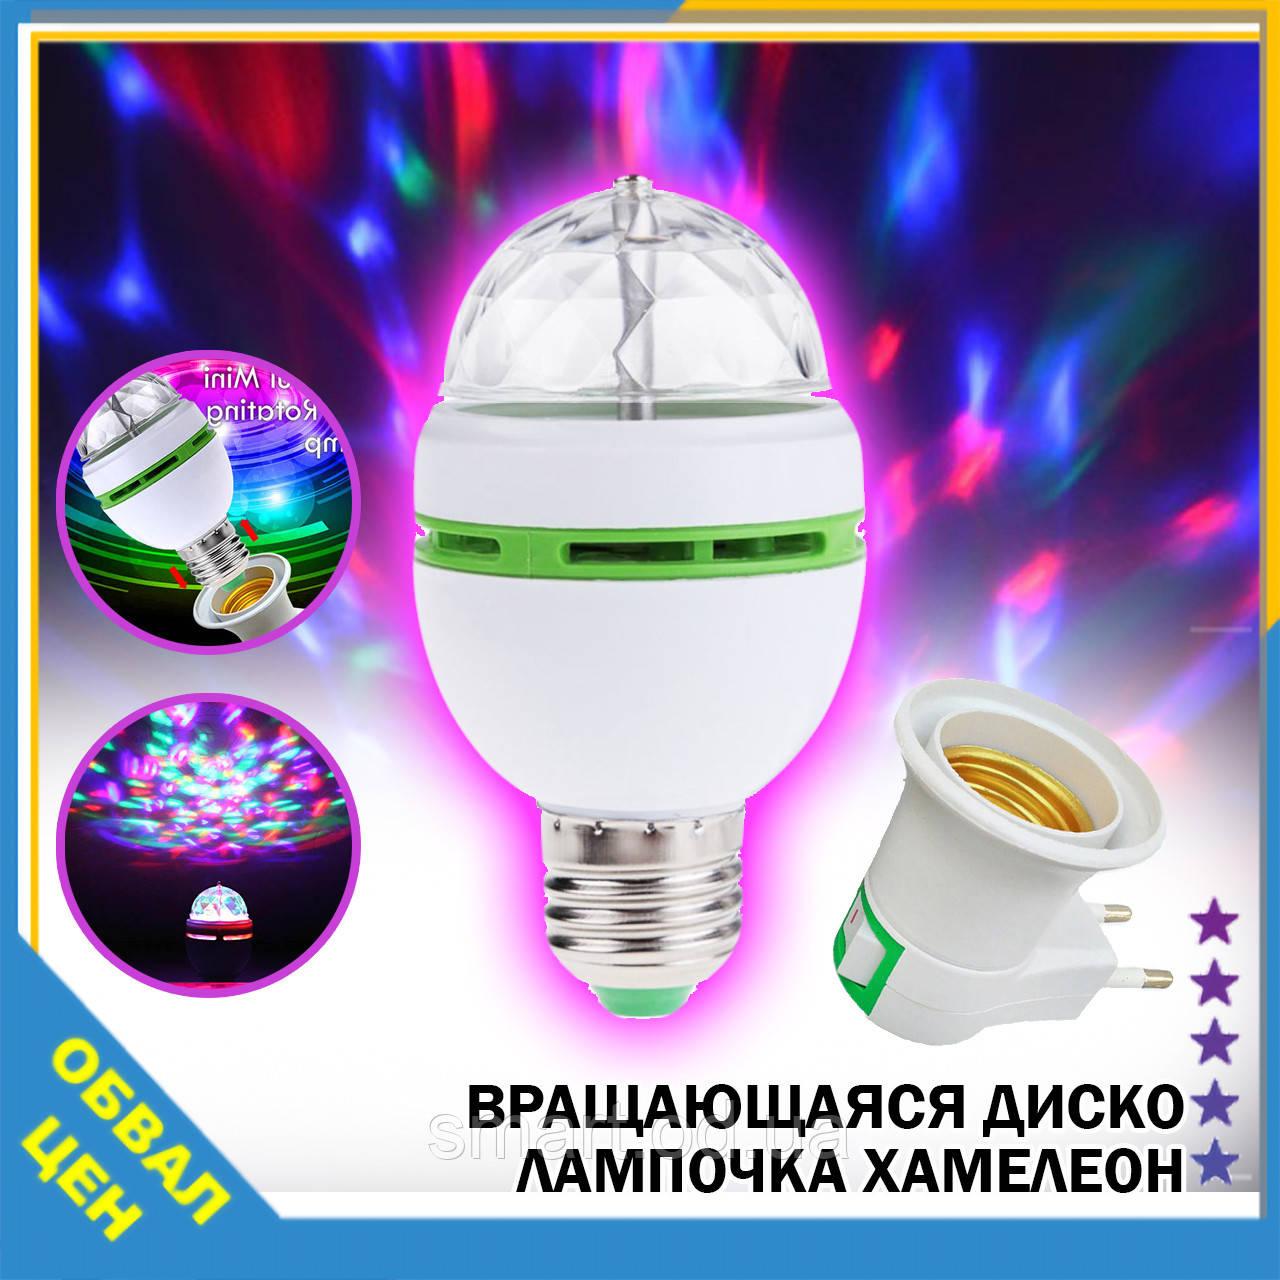 Карнавальная вращающаяся диско лампочка хамелеон Led mini party light lamp гирлянда для праздничный шар